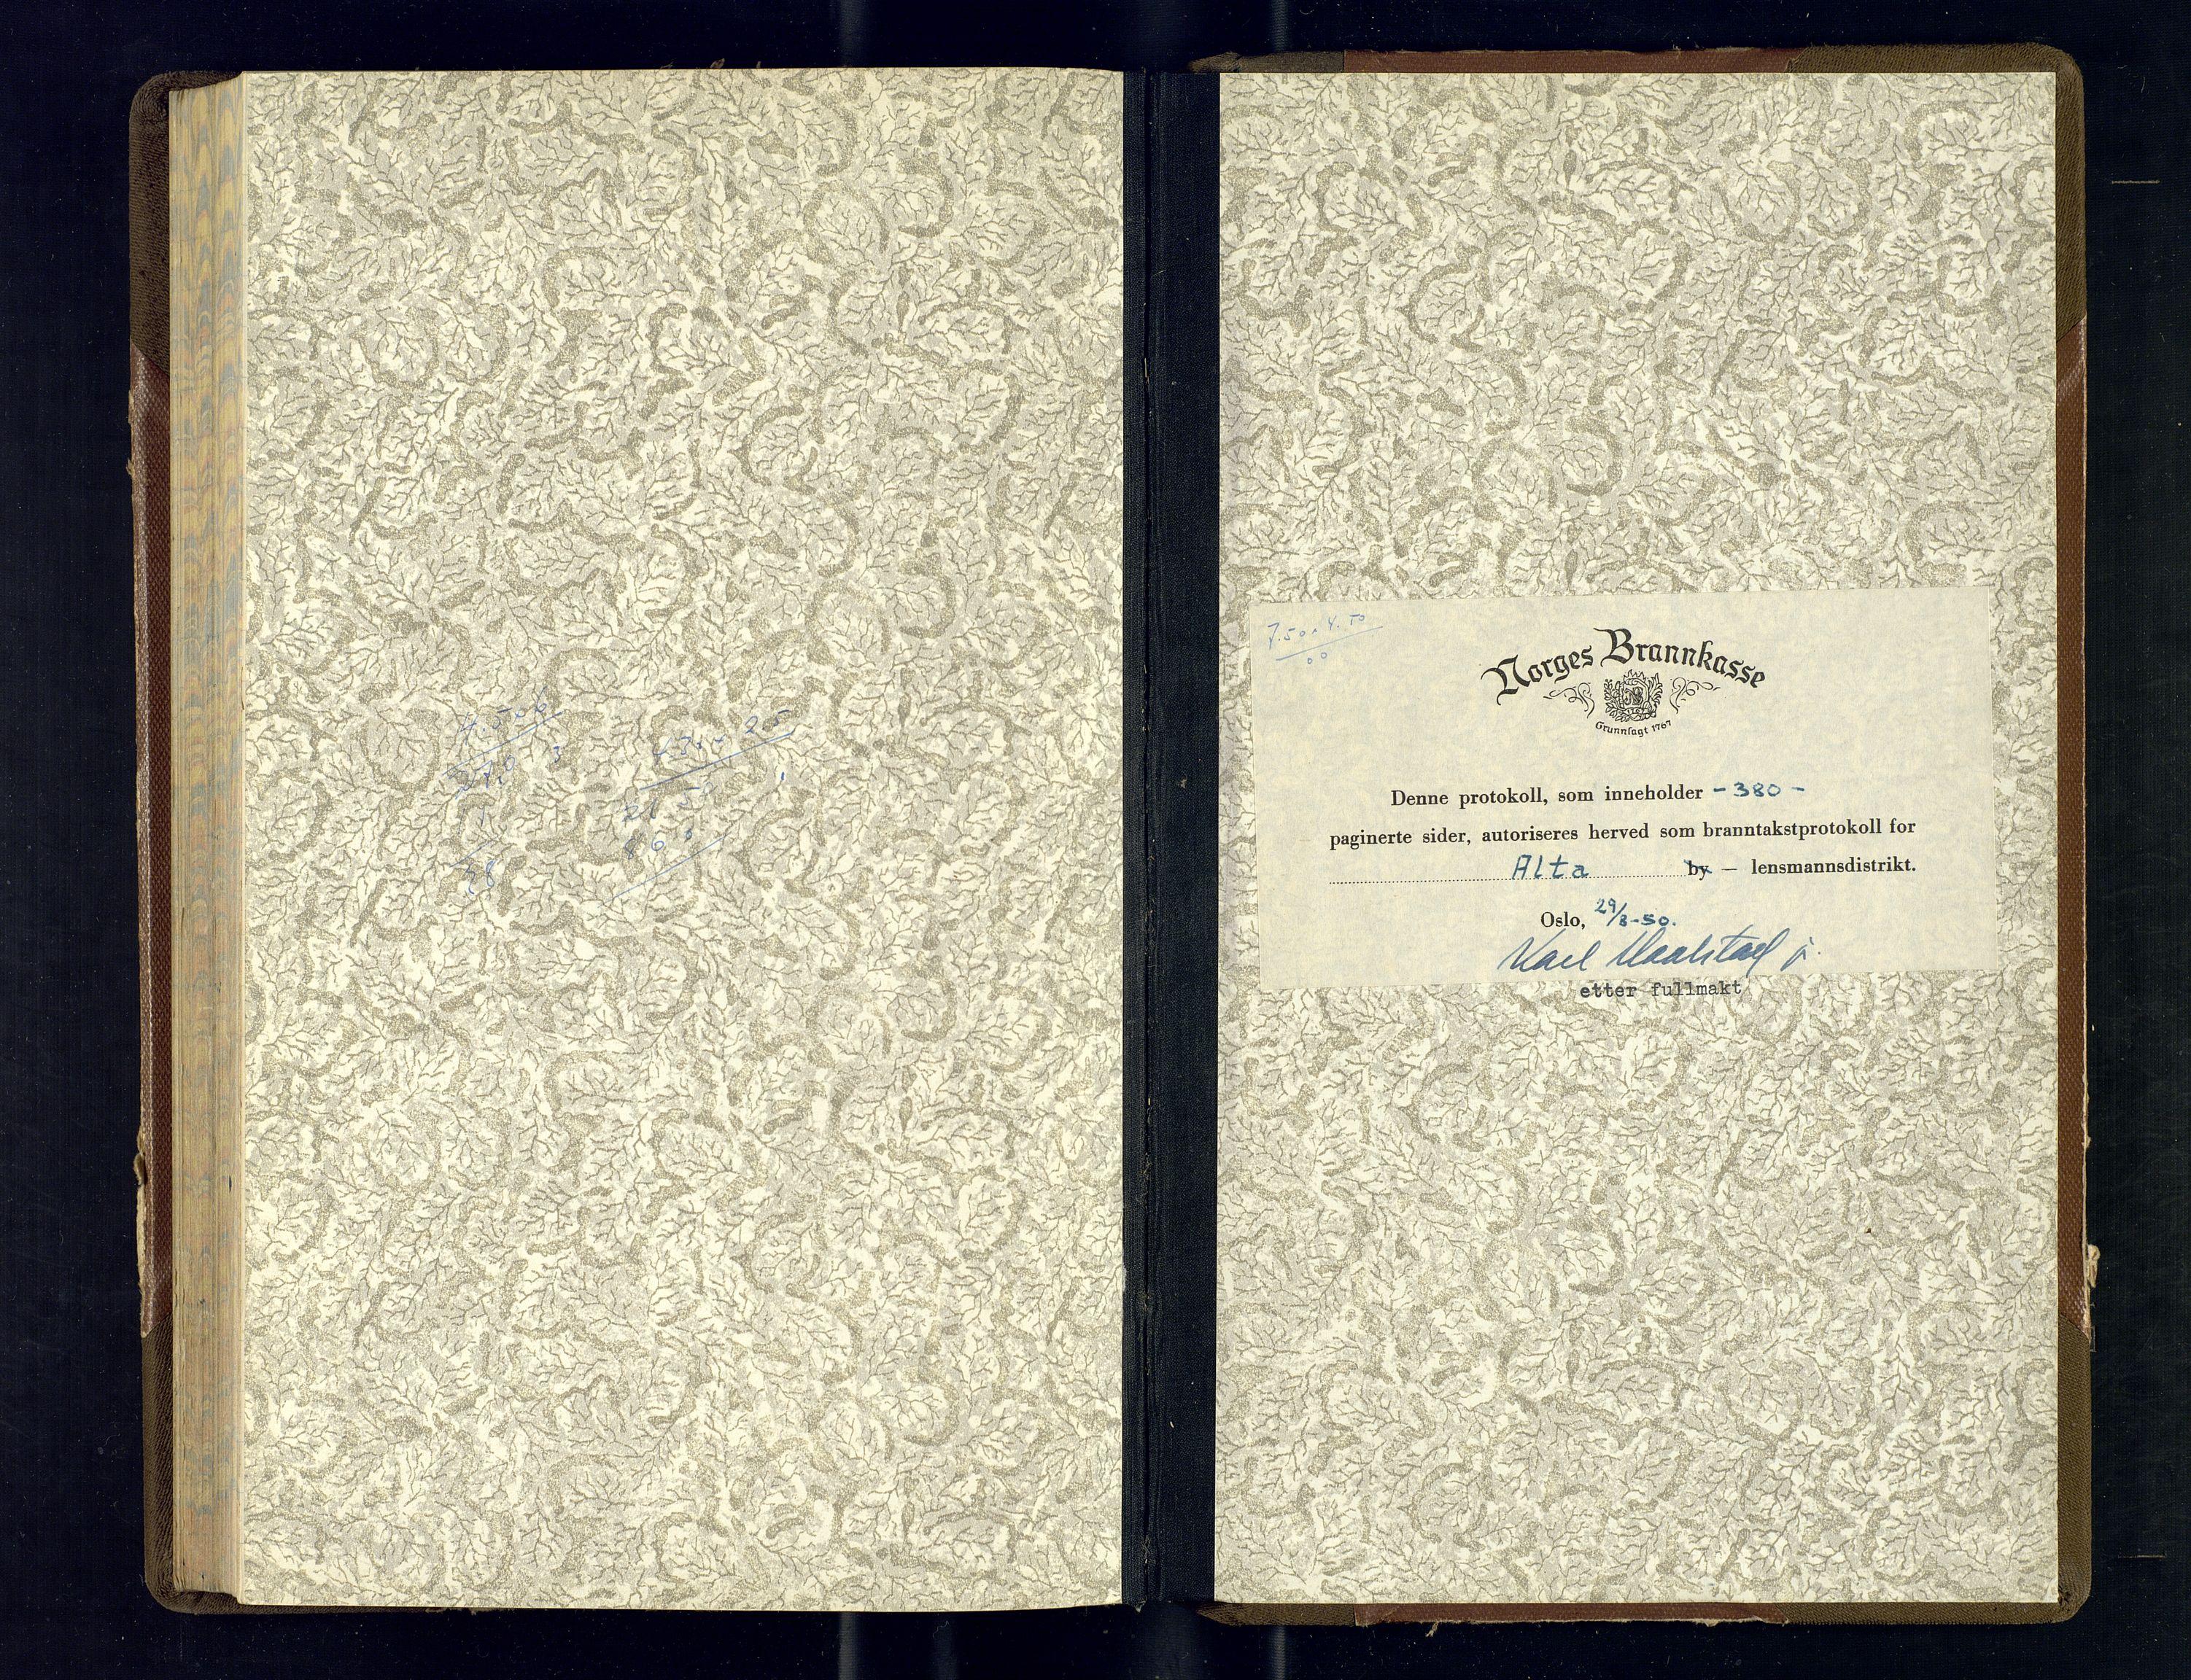 SATØ, Lensmannen i Alta, O/Ob/L0183: Branntakstprotokoll, 1950-1953